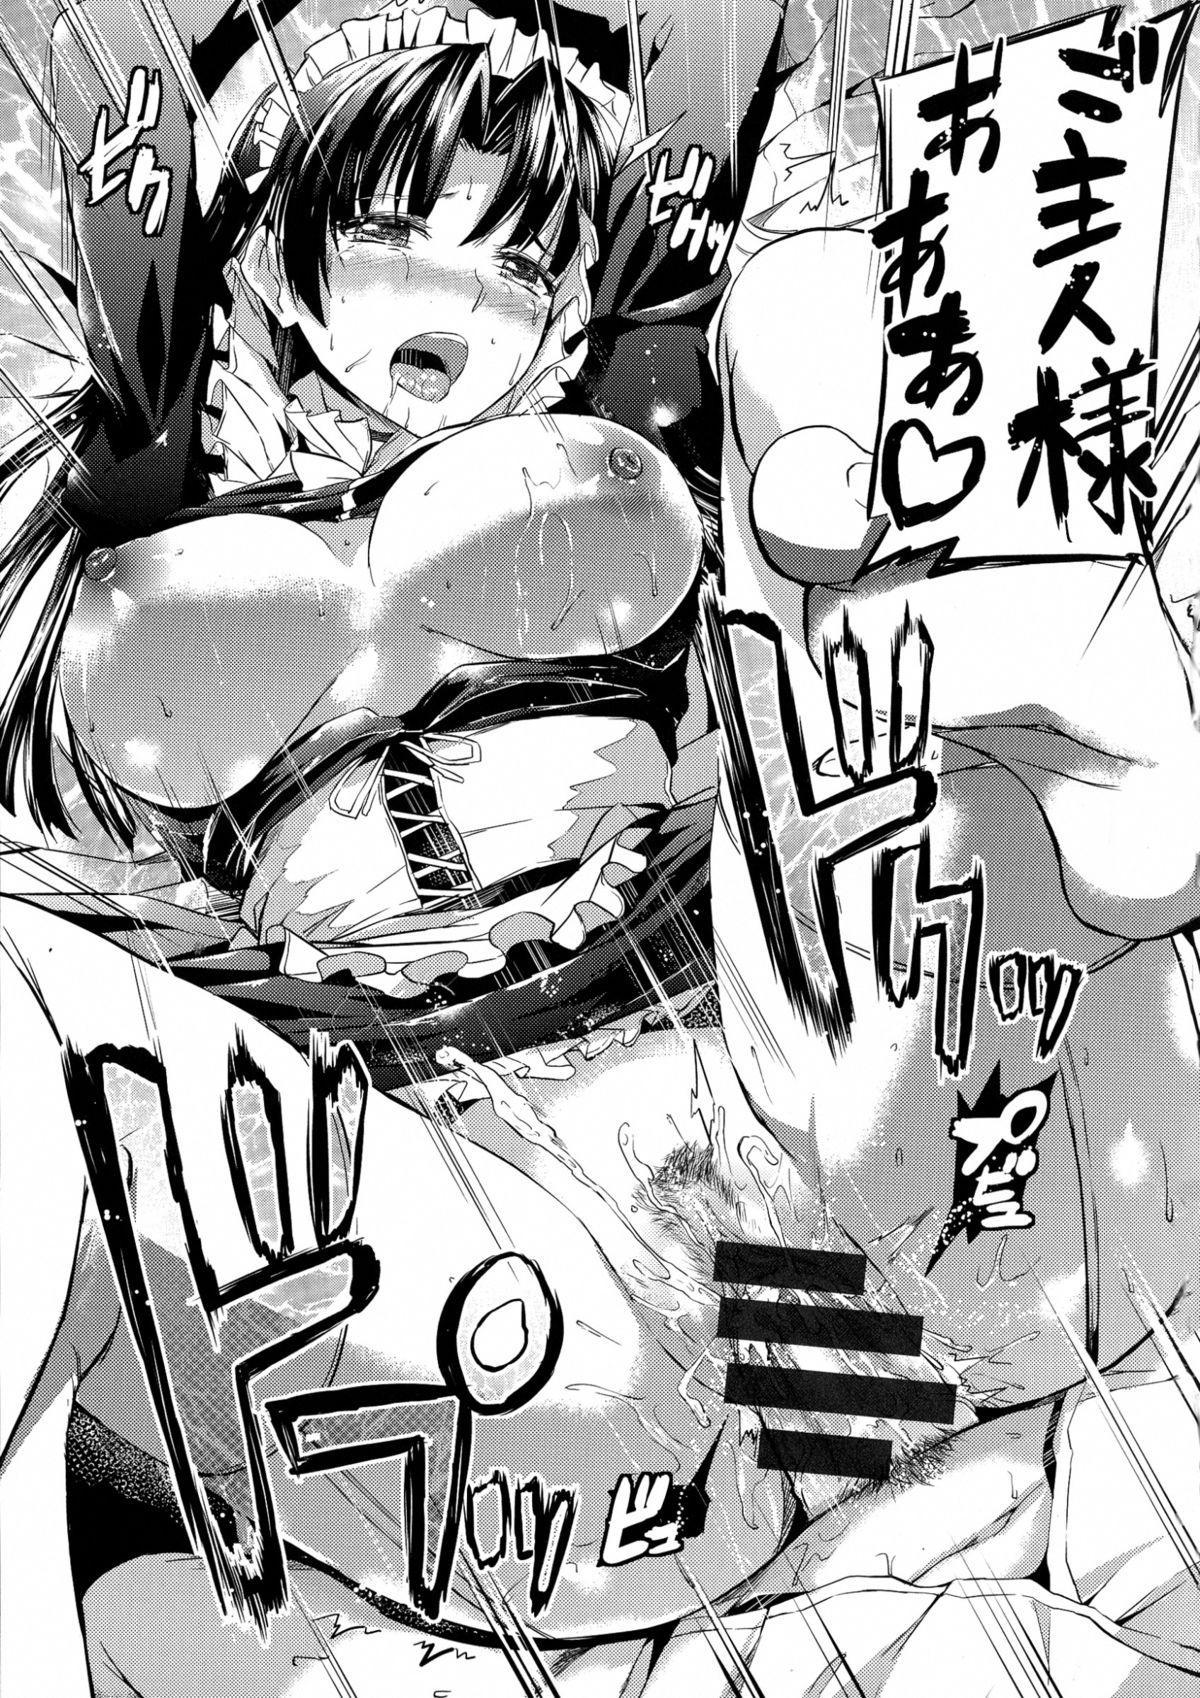 Ojousama no Maid Jijou 124